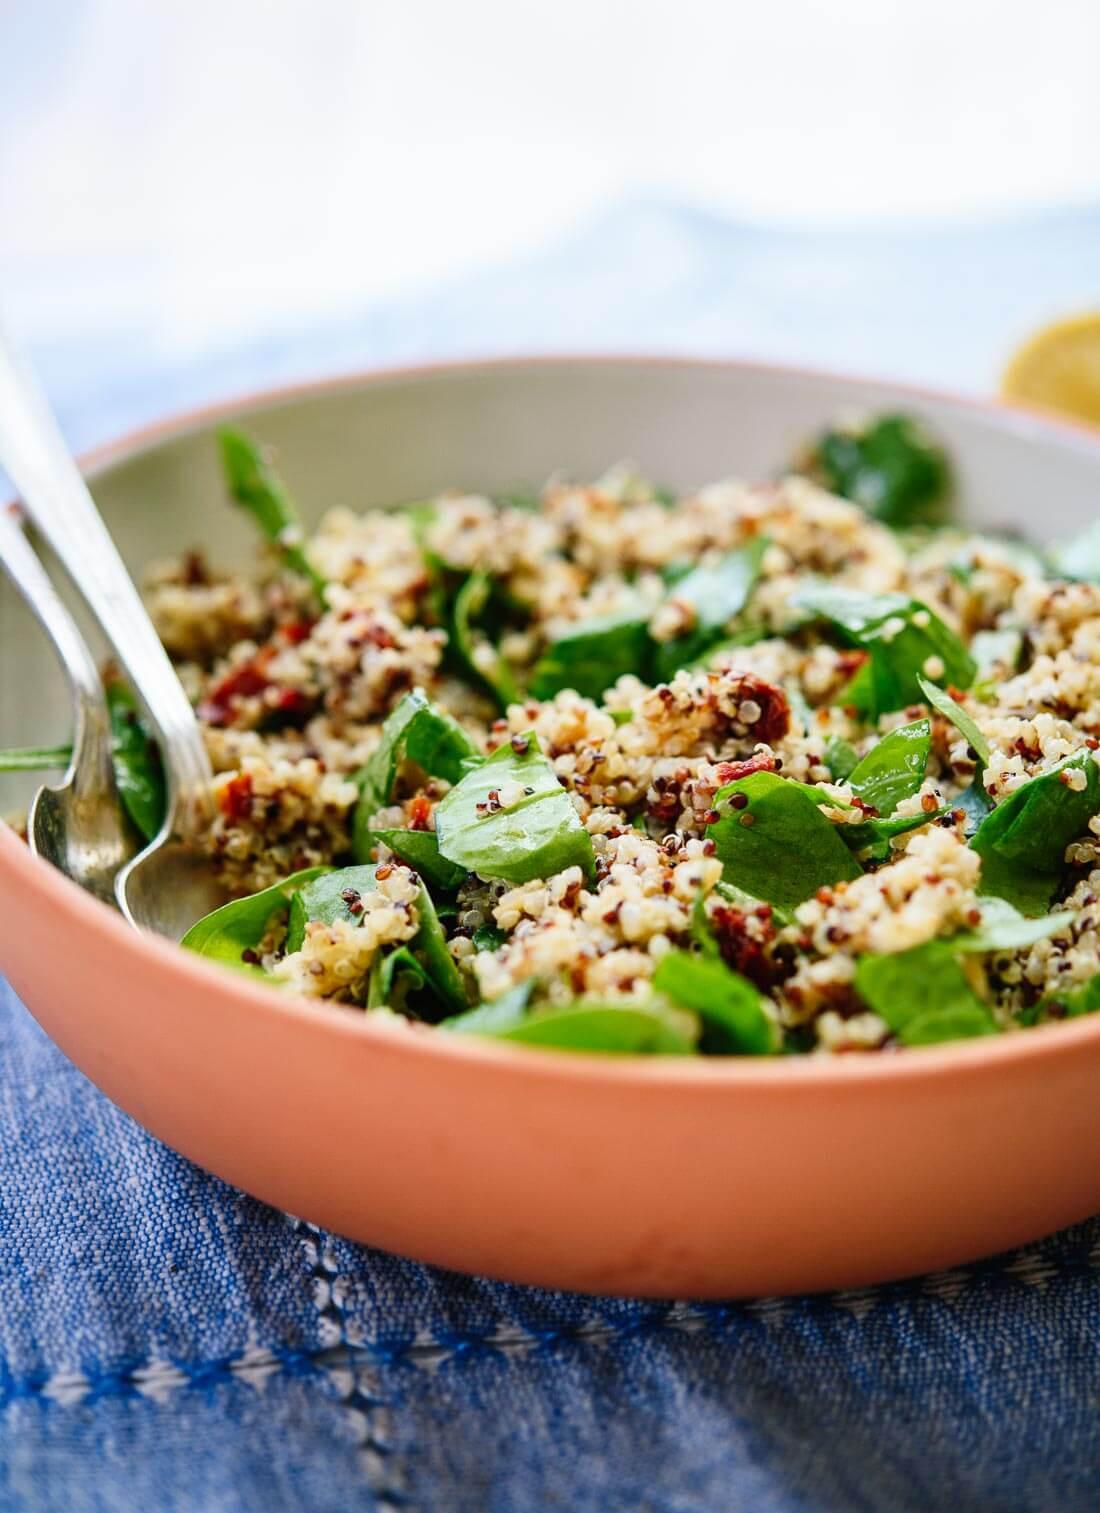 Quinoa Recipes Salad  Sun Dried Tomato Spinach and Quinoa Salad Cookie and Kate